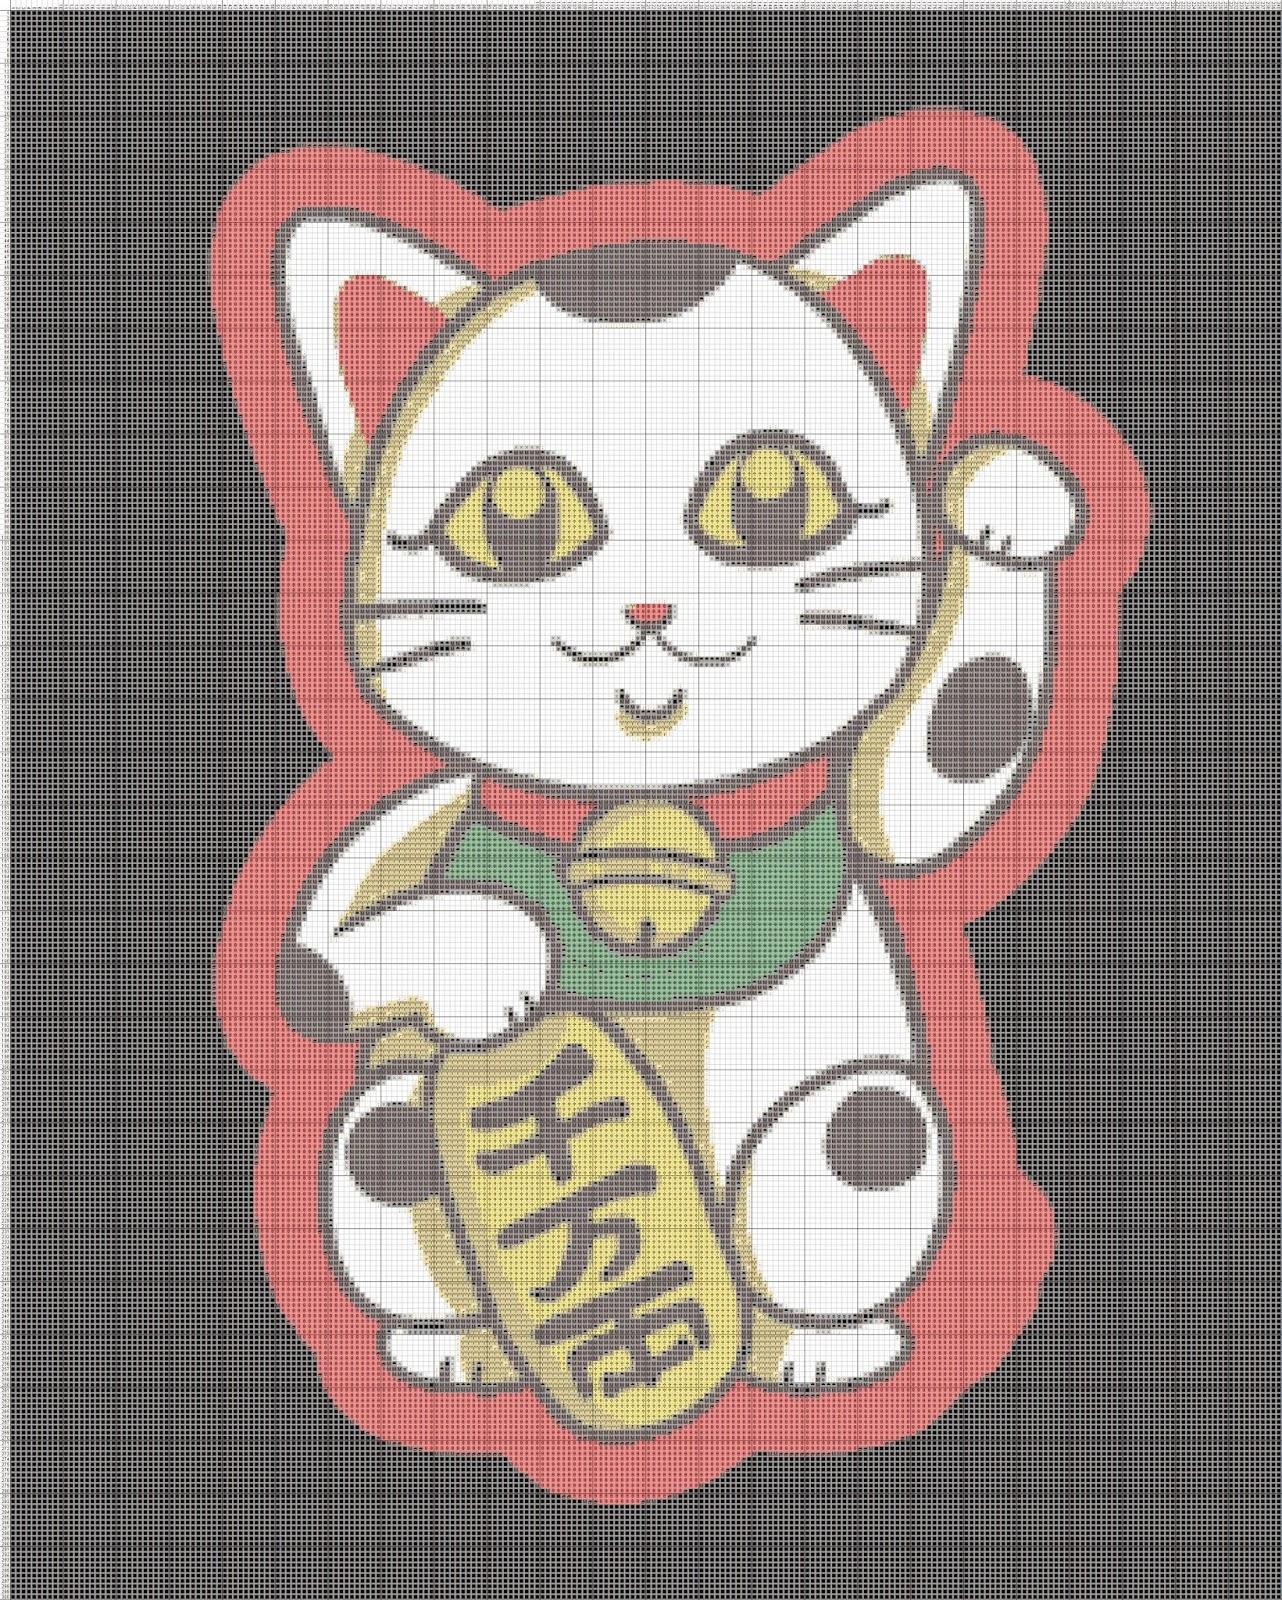 Gambar Pola Kristik Kucing Keberuntungan - Maneki Neko